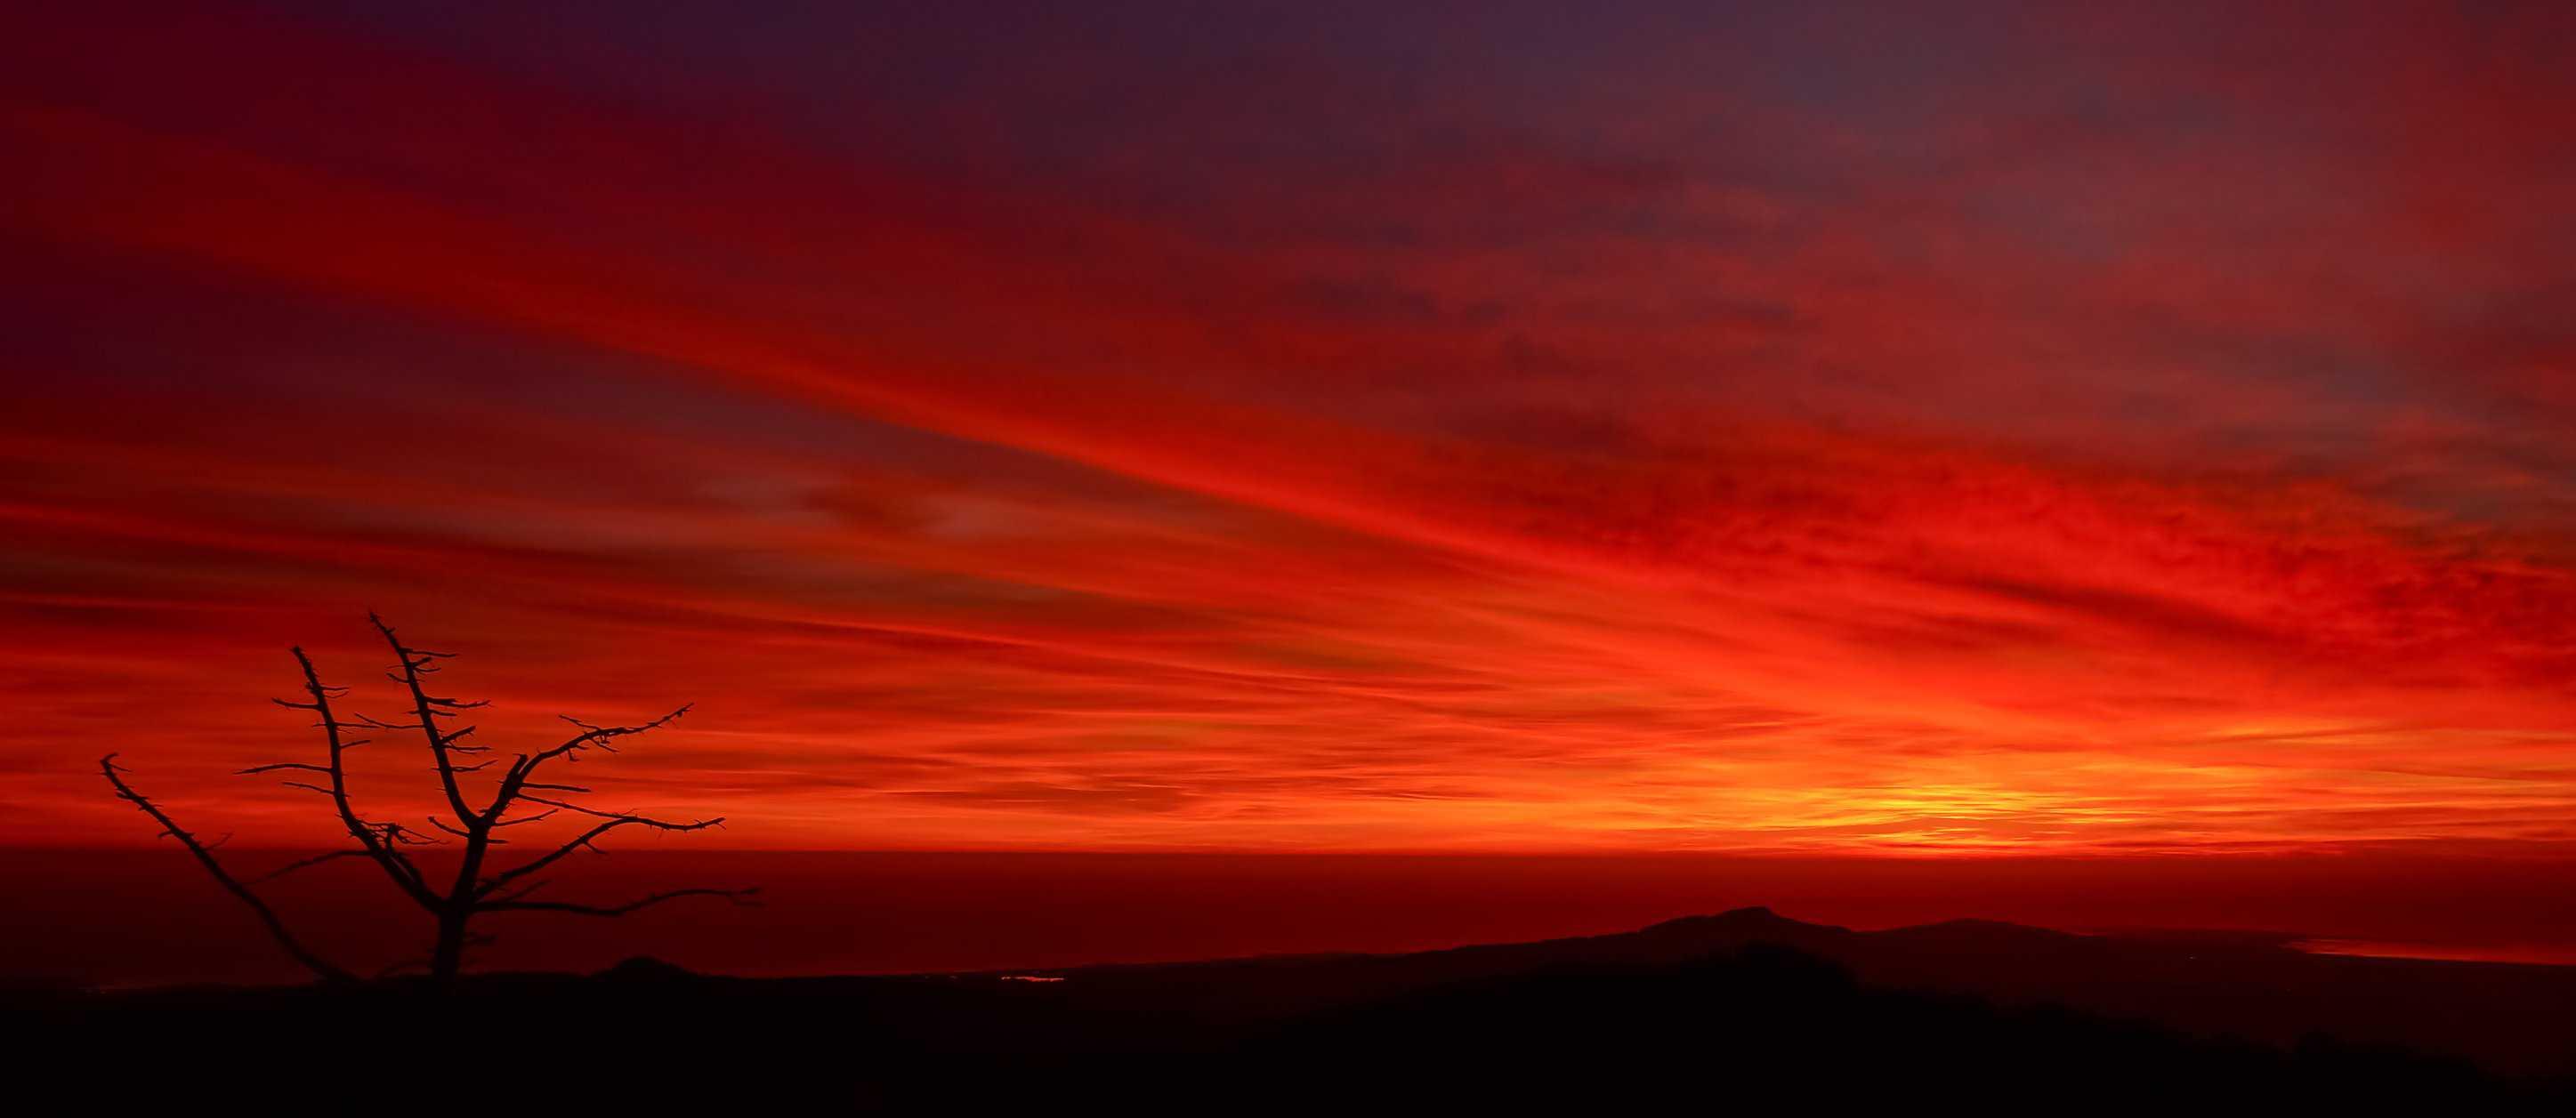 Dark Images Wallpaper Hd Free Picture Sunrise Red Dawn Dusk Sky Sun Nature